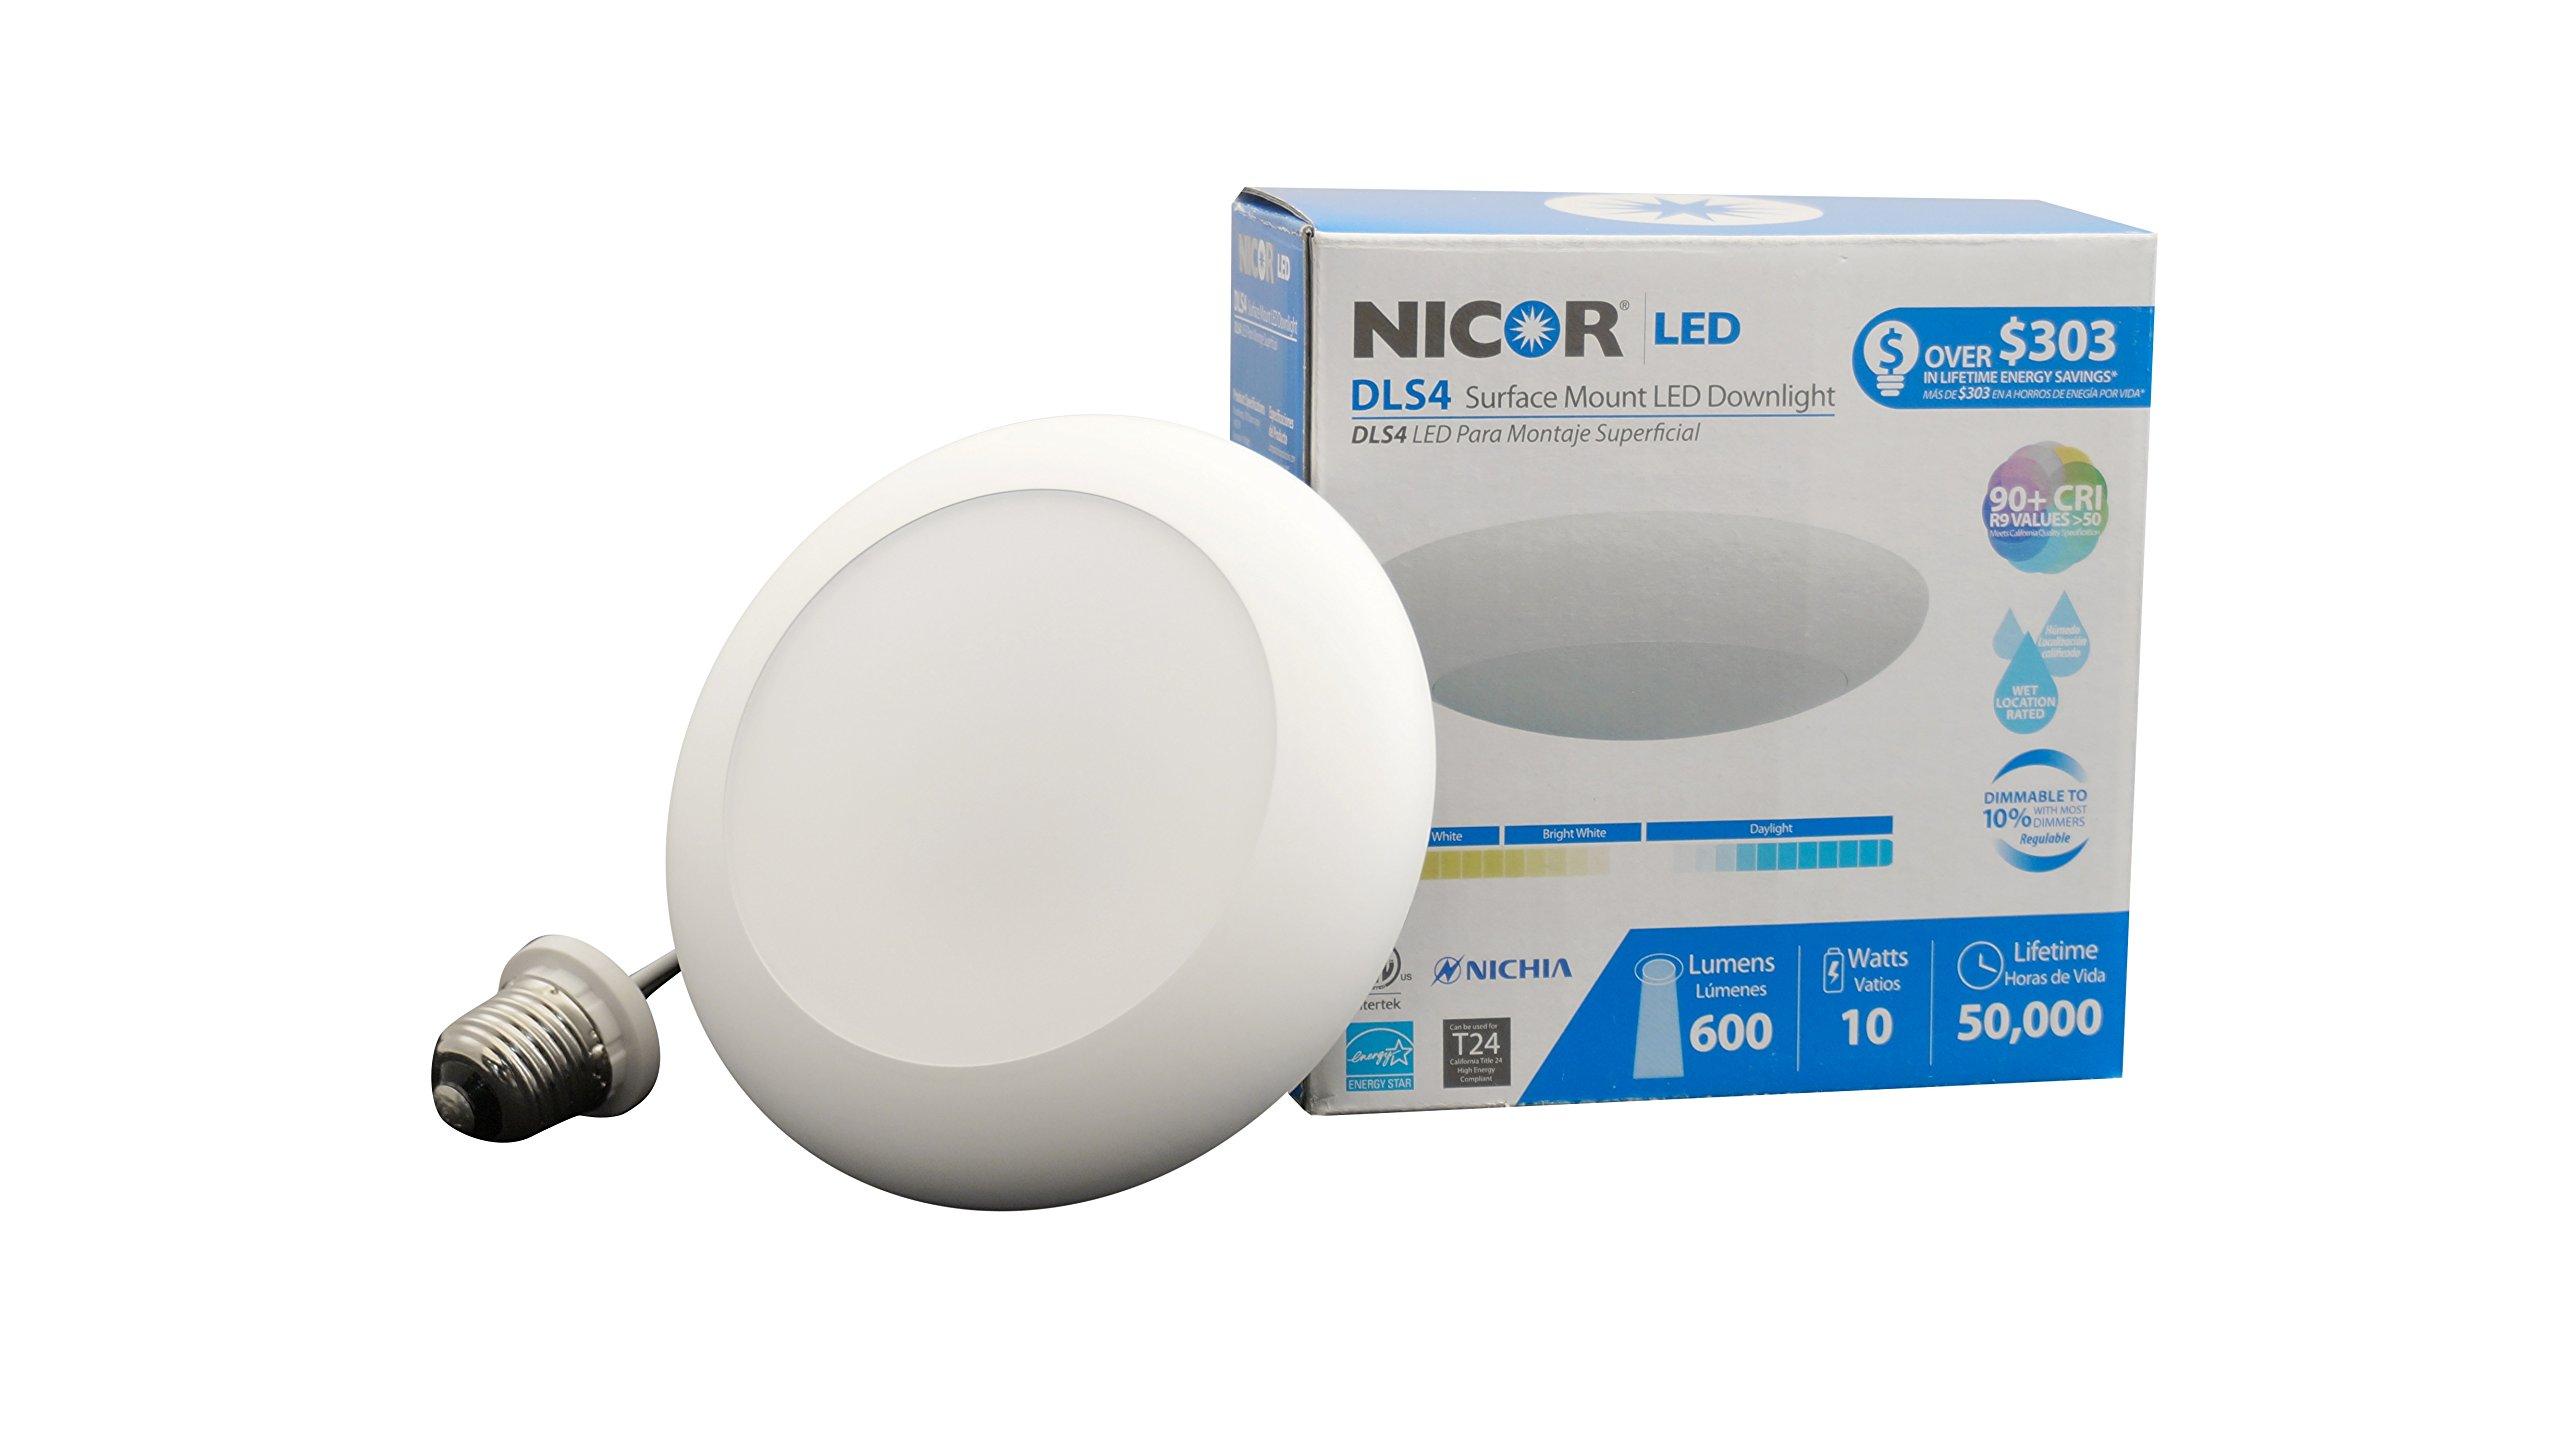 NICOR Lighting Dimmable Surface Mount 3000K LED Downlight Kit for 4-Inch Housings, White Trim (DLS4-2006-120-3K-WH)